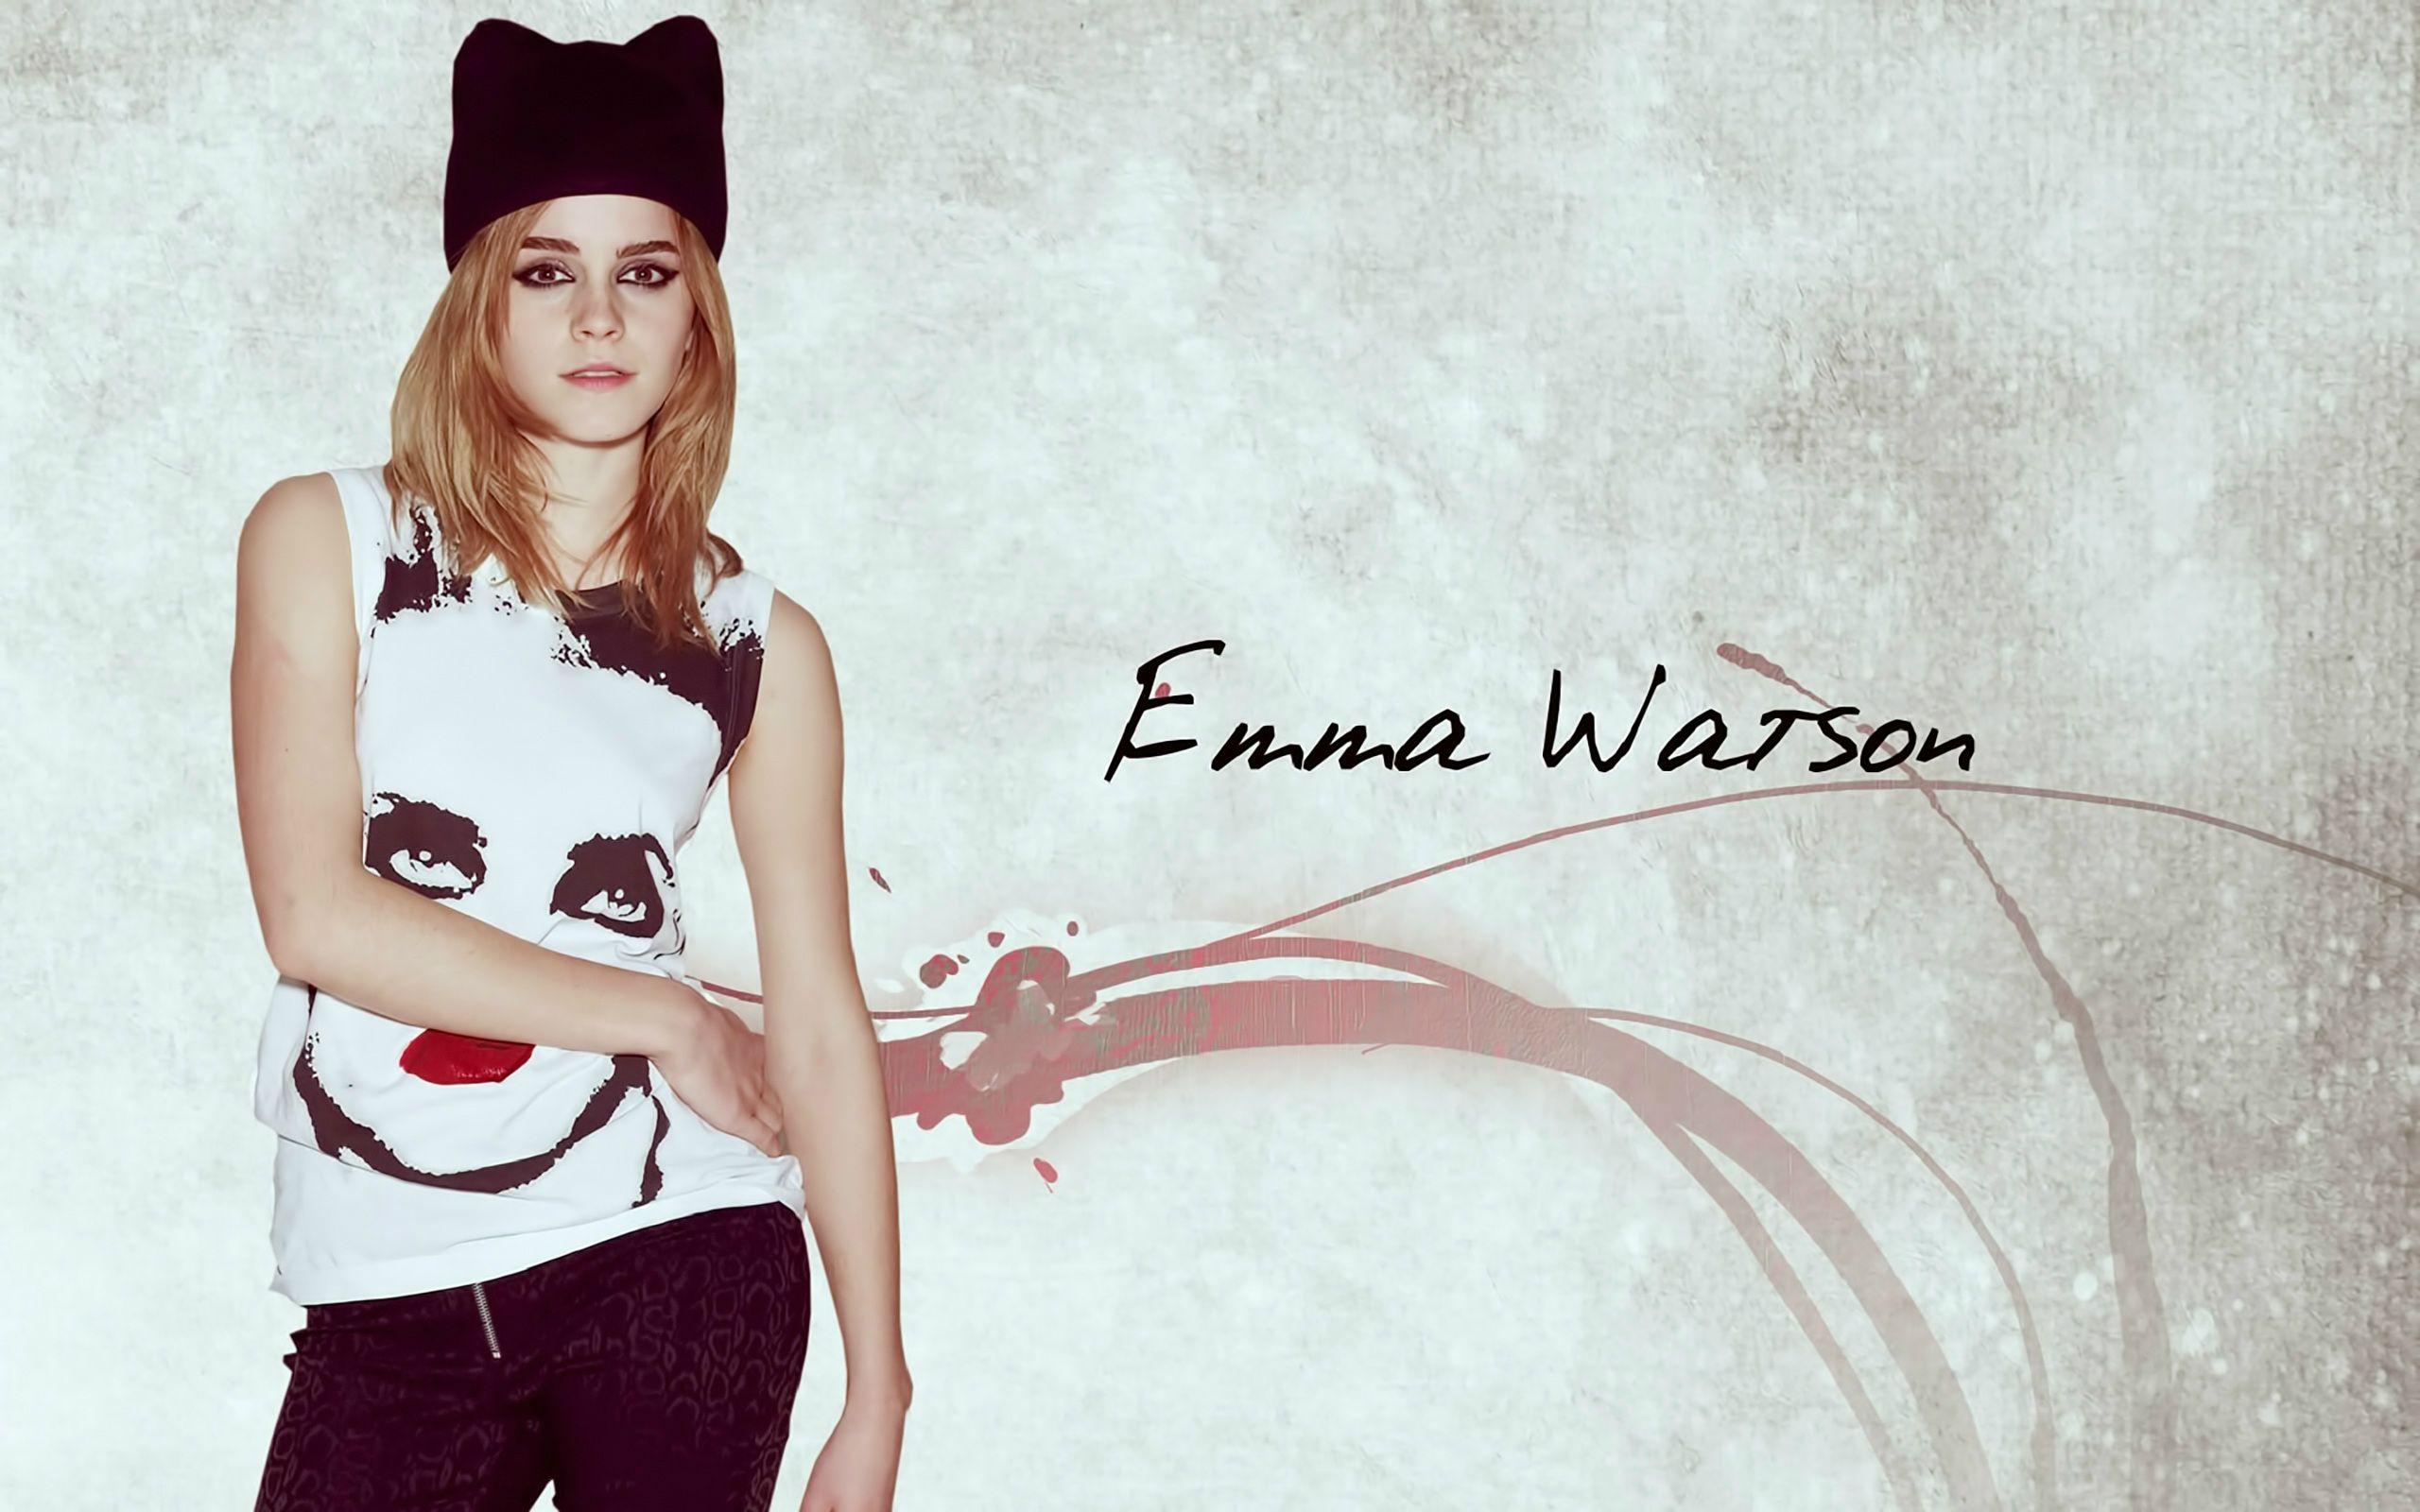 Emma watson 2016 hd wallpapers emma watson pinterest emma watson smile emma watson and - Emma watson wallpaper 2016 ...